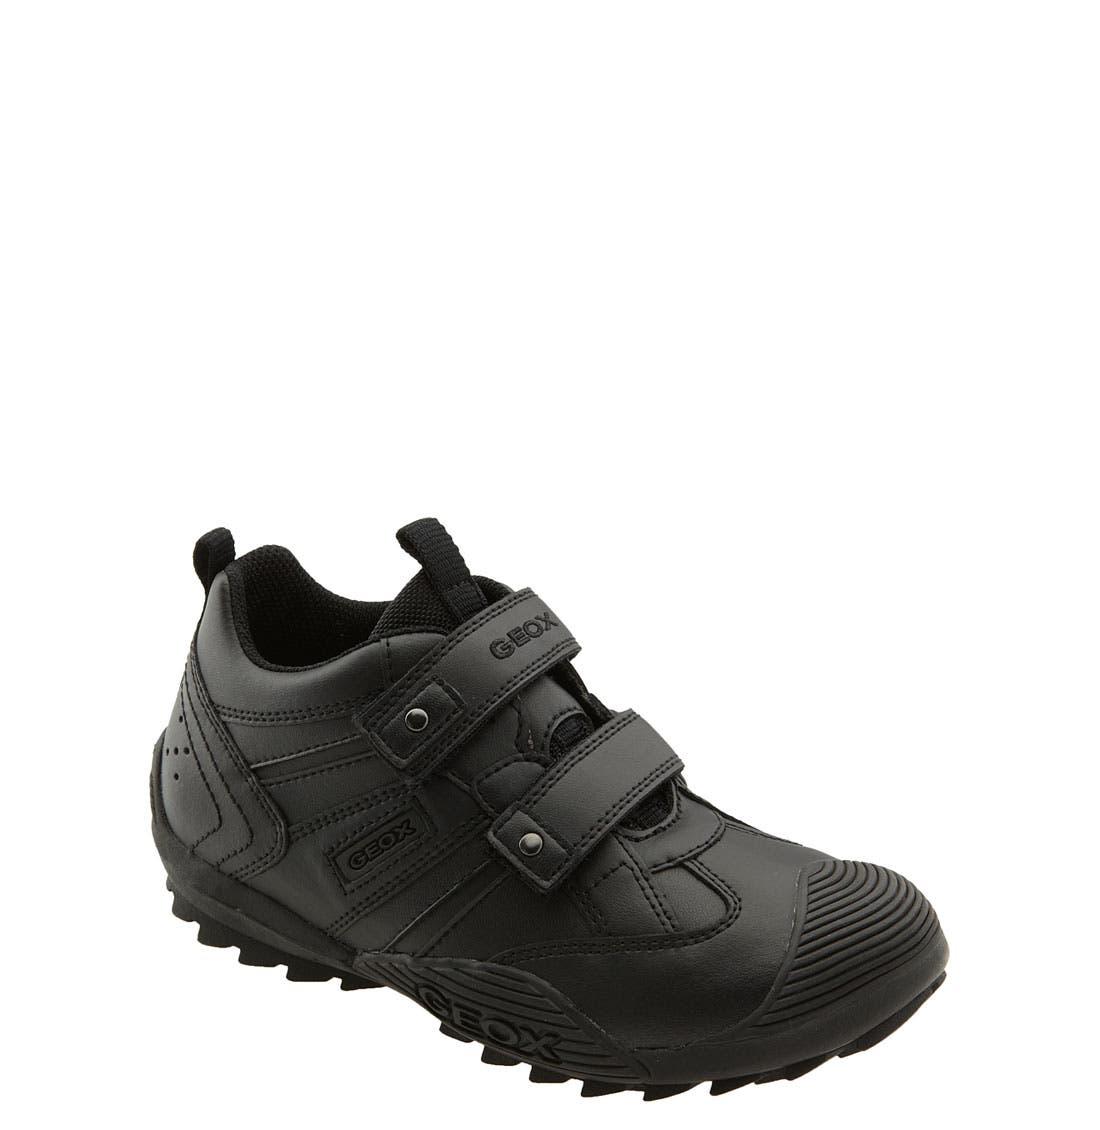 Main Image - Geox 'Savage' Sneaker (Toddler, Little Kid & Big Kid)